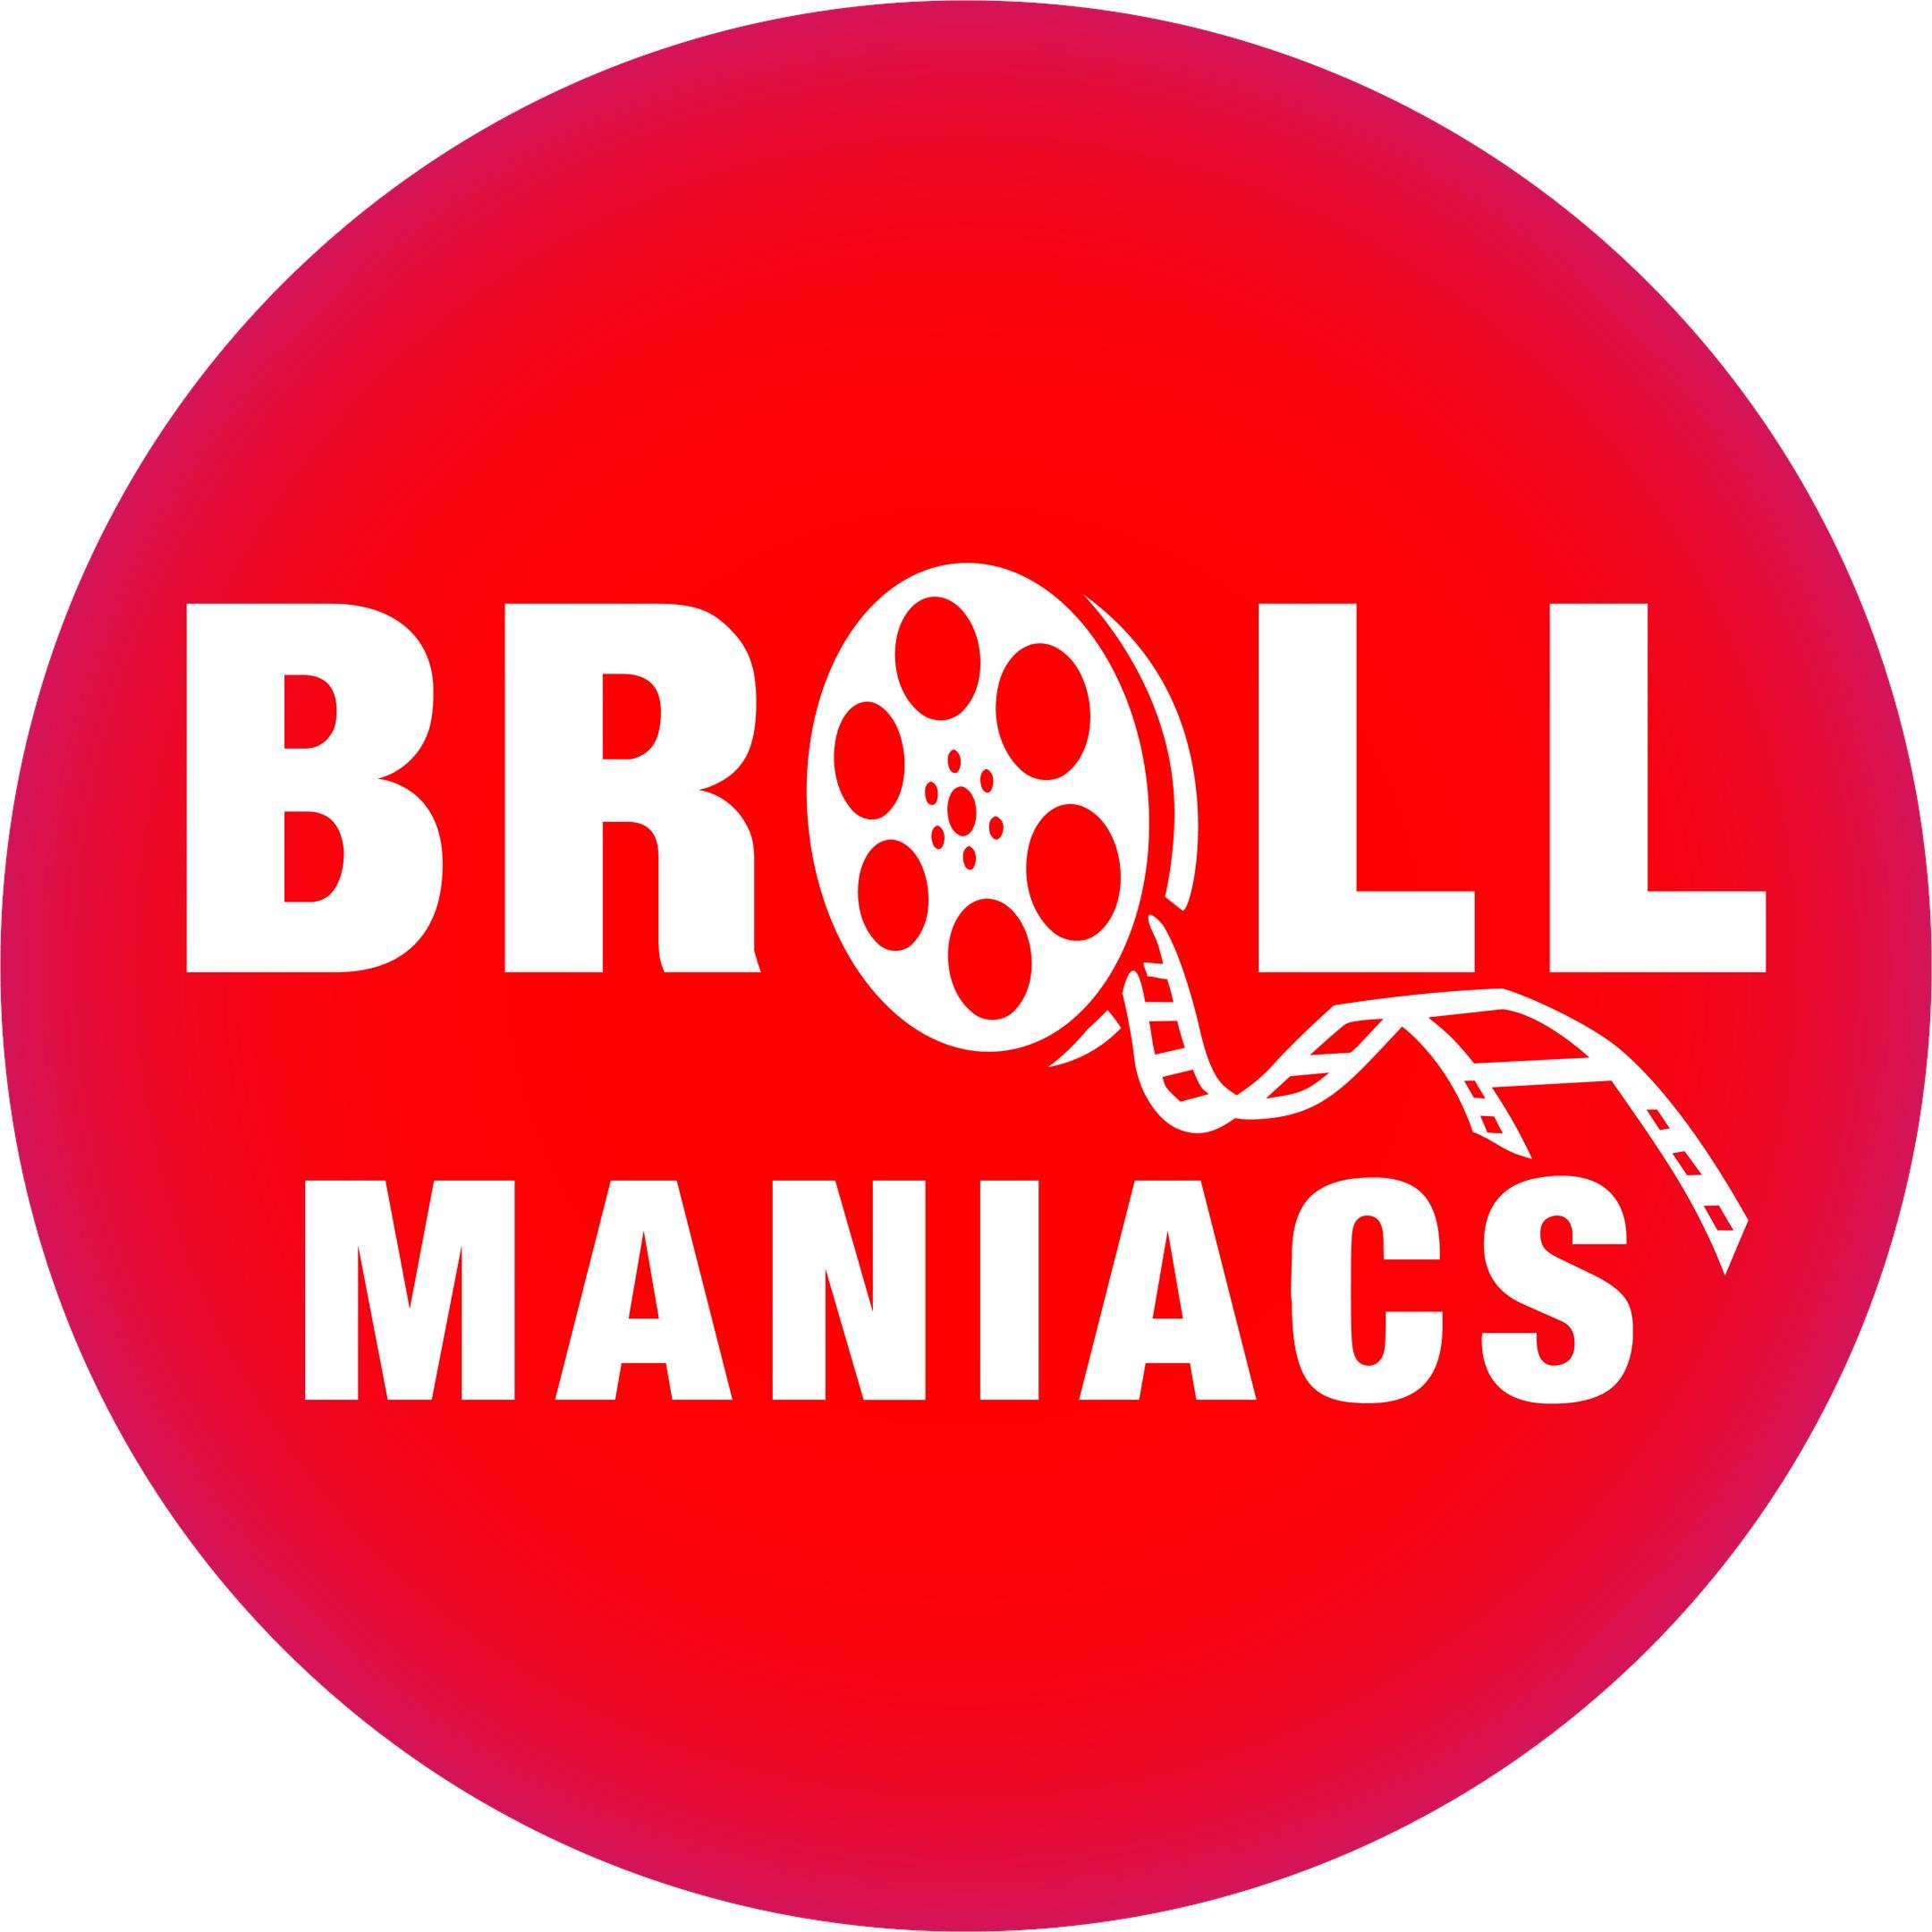 -broll-maniacs-logo2160x2160